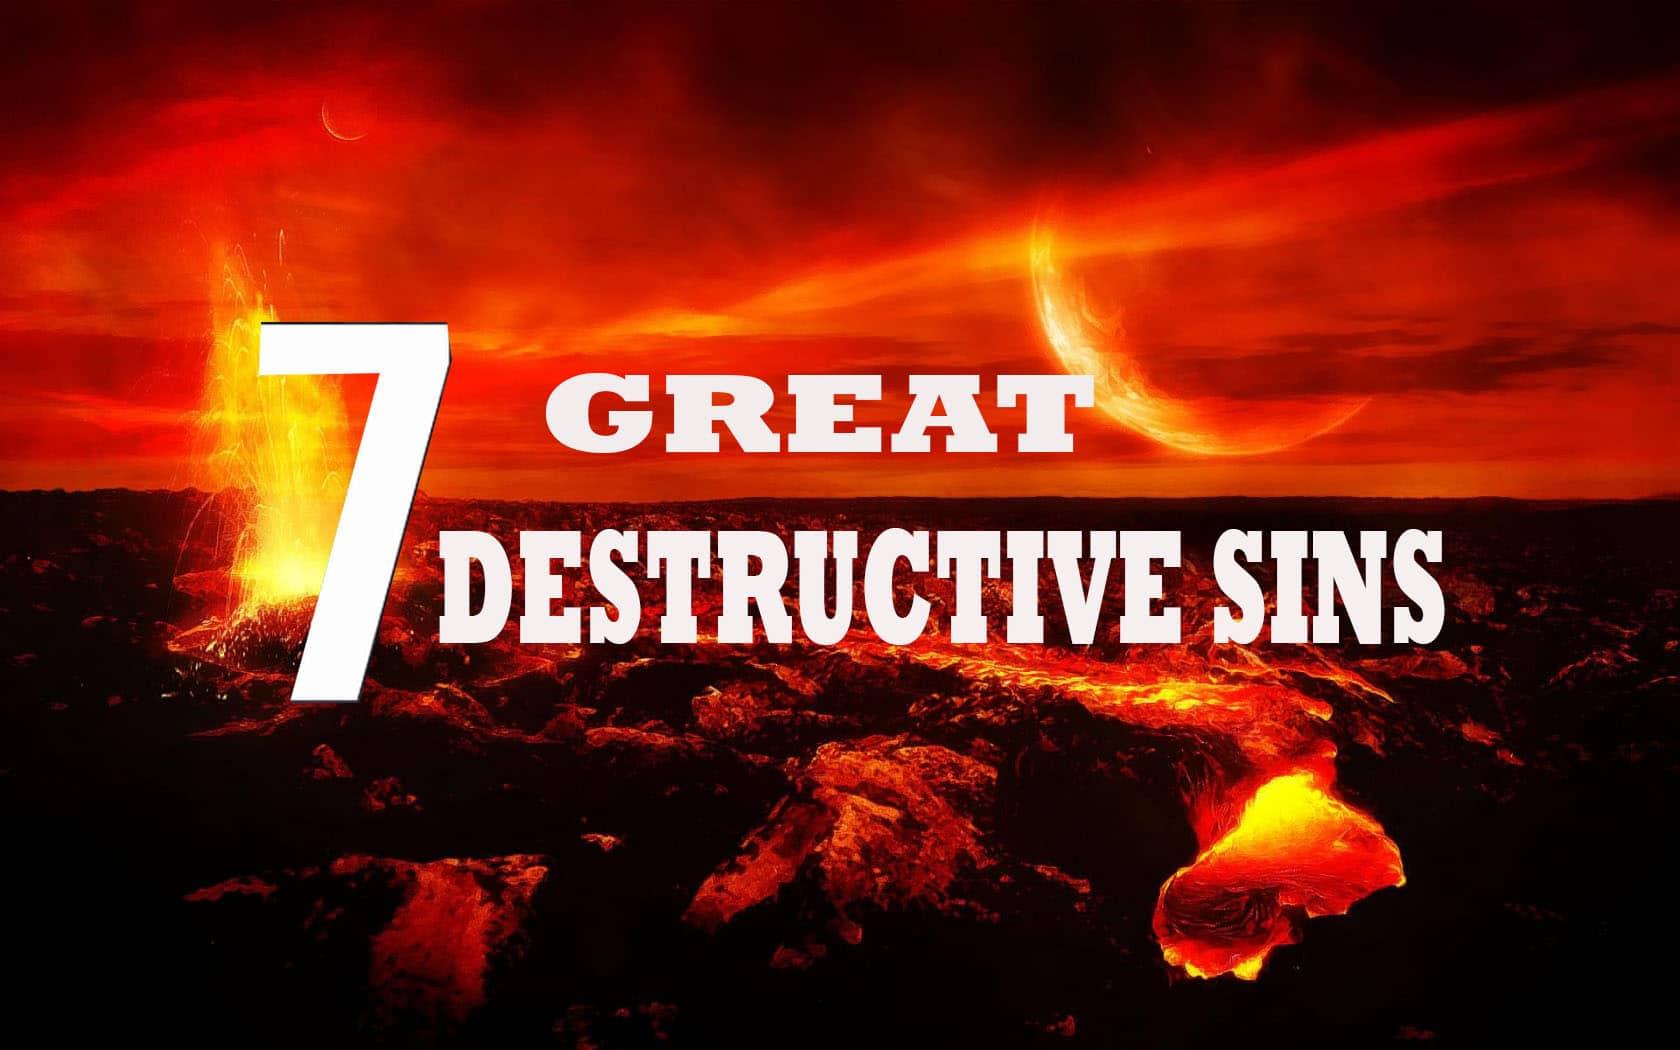 The seven great destructive sins 1